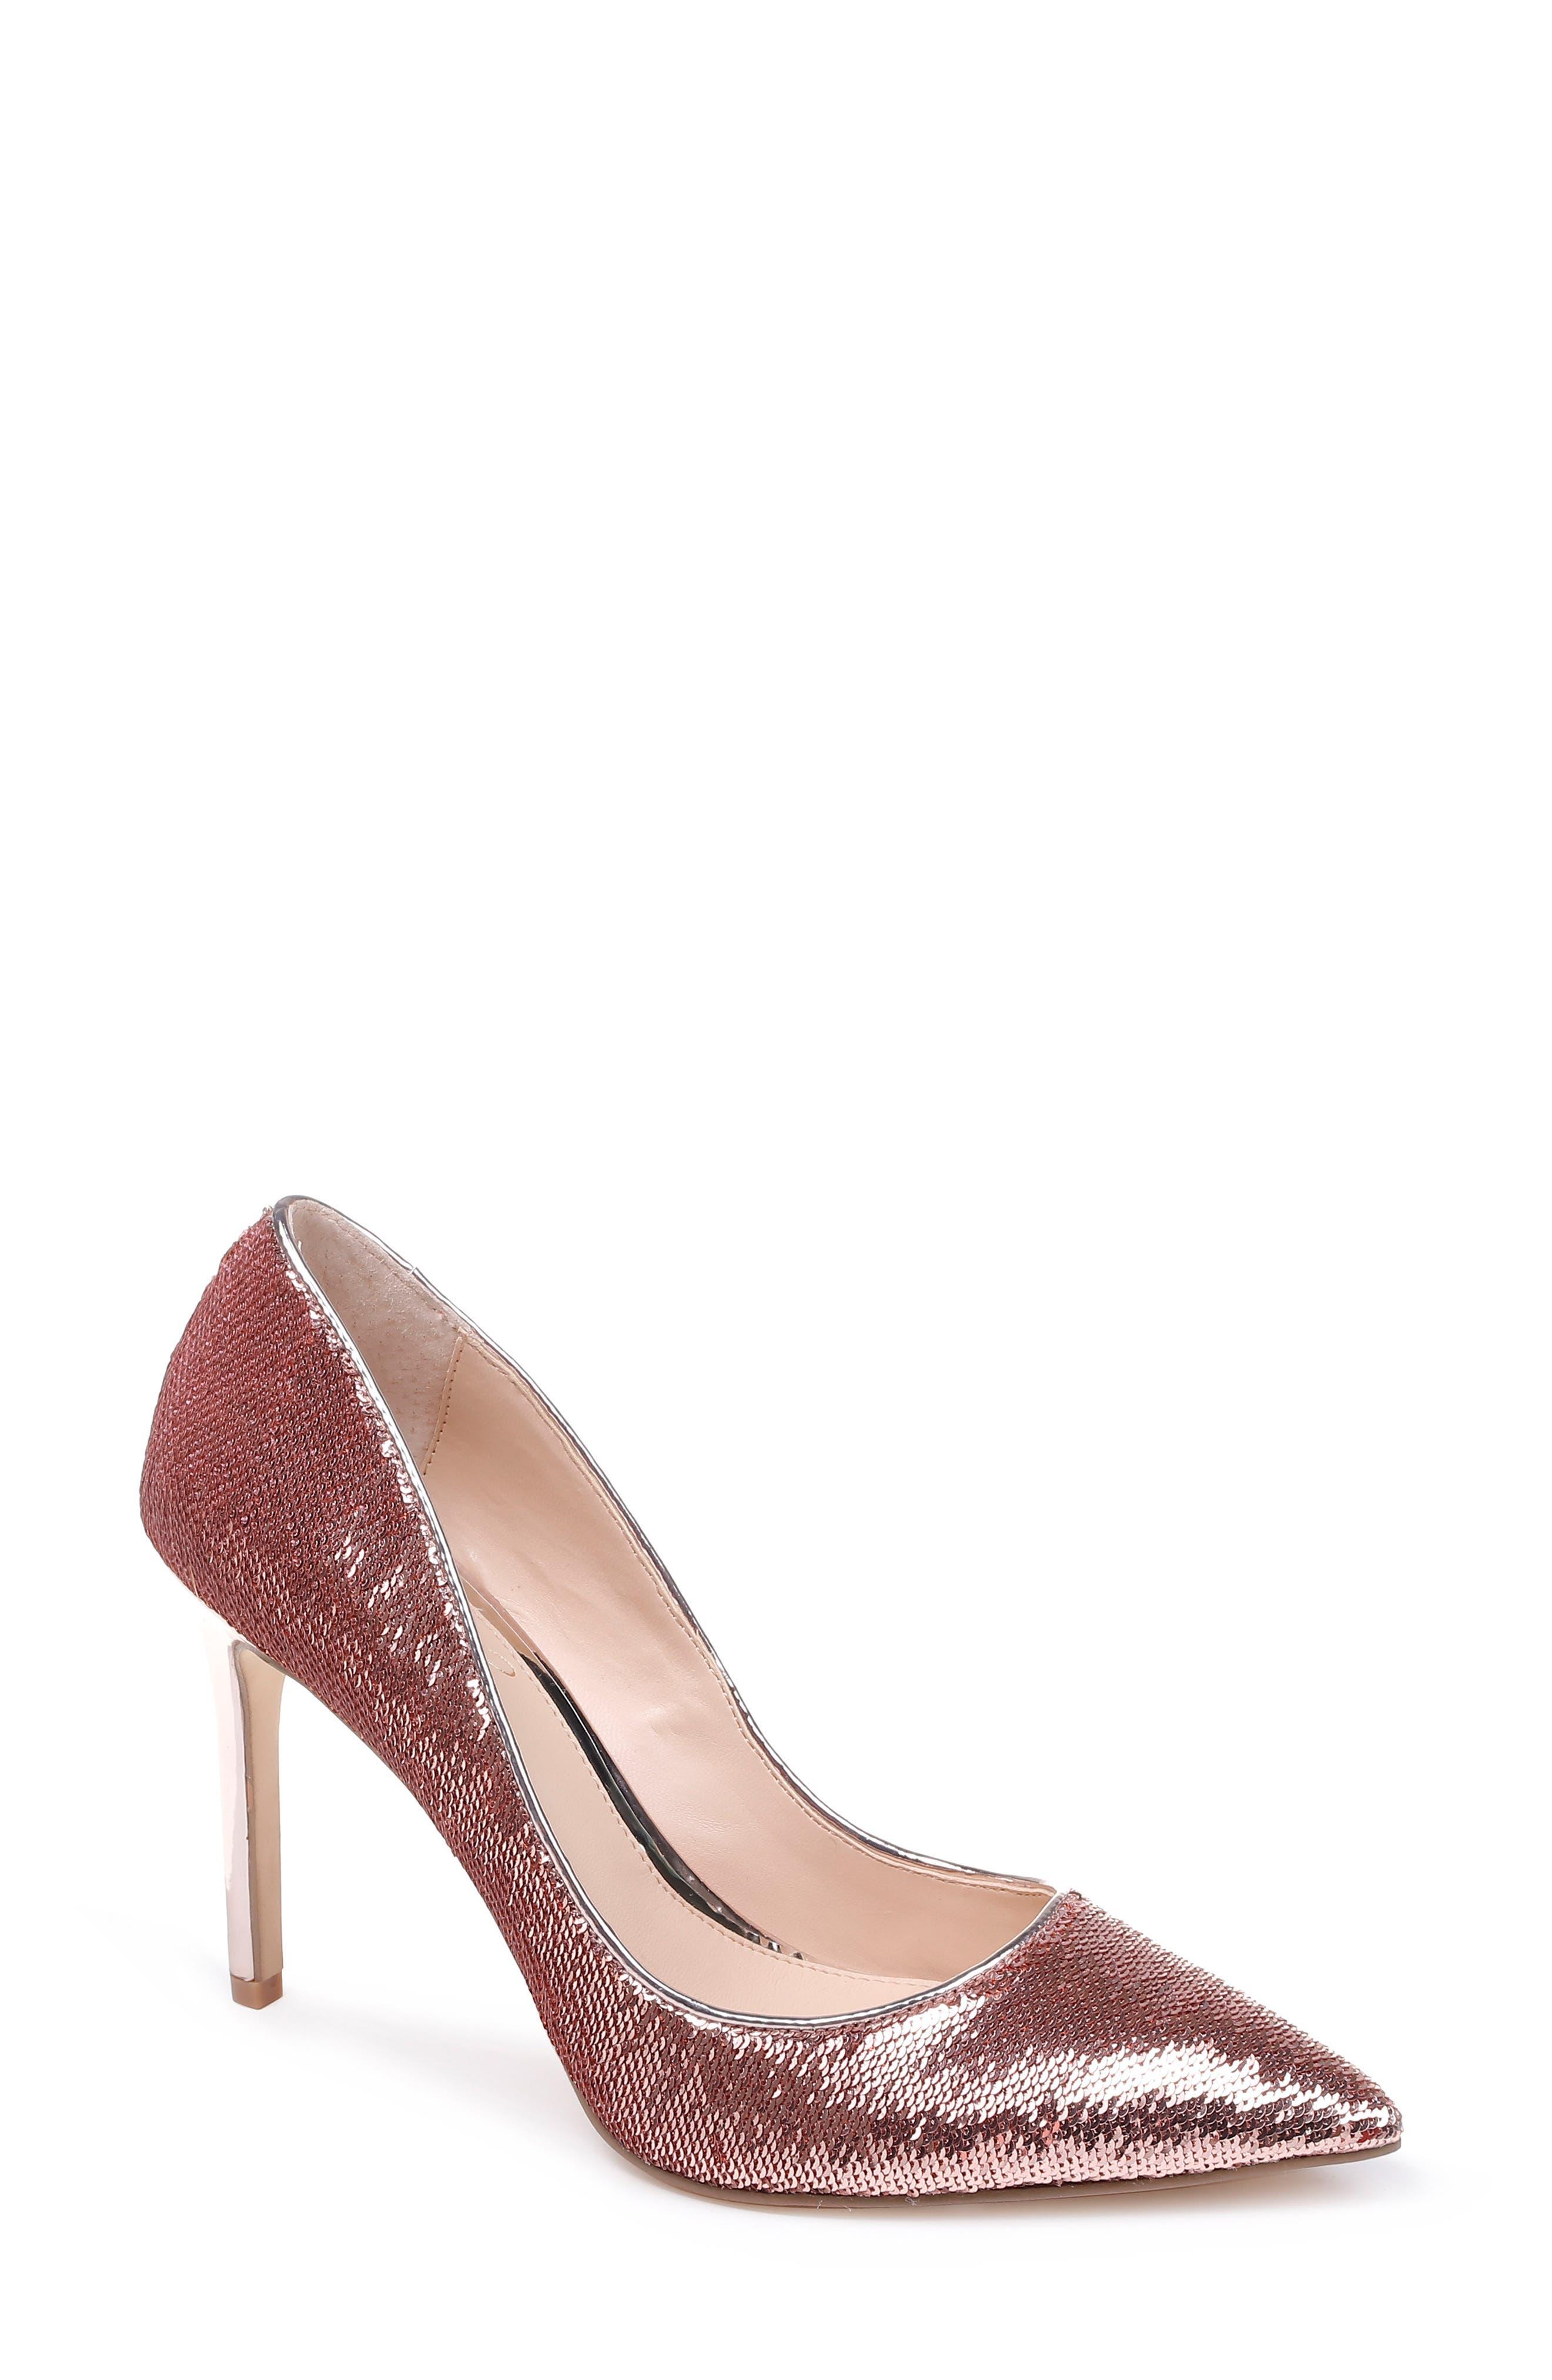 164fdf5cdcbc5 jewel badgley mischka high heel pumps for women - Buy best women's jewel  badgley mischka high heel pumps on Cools.com Shop